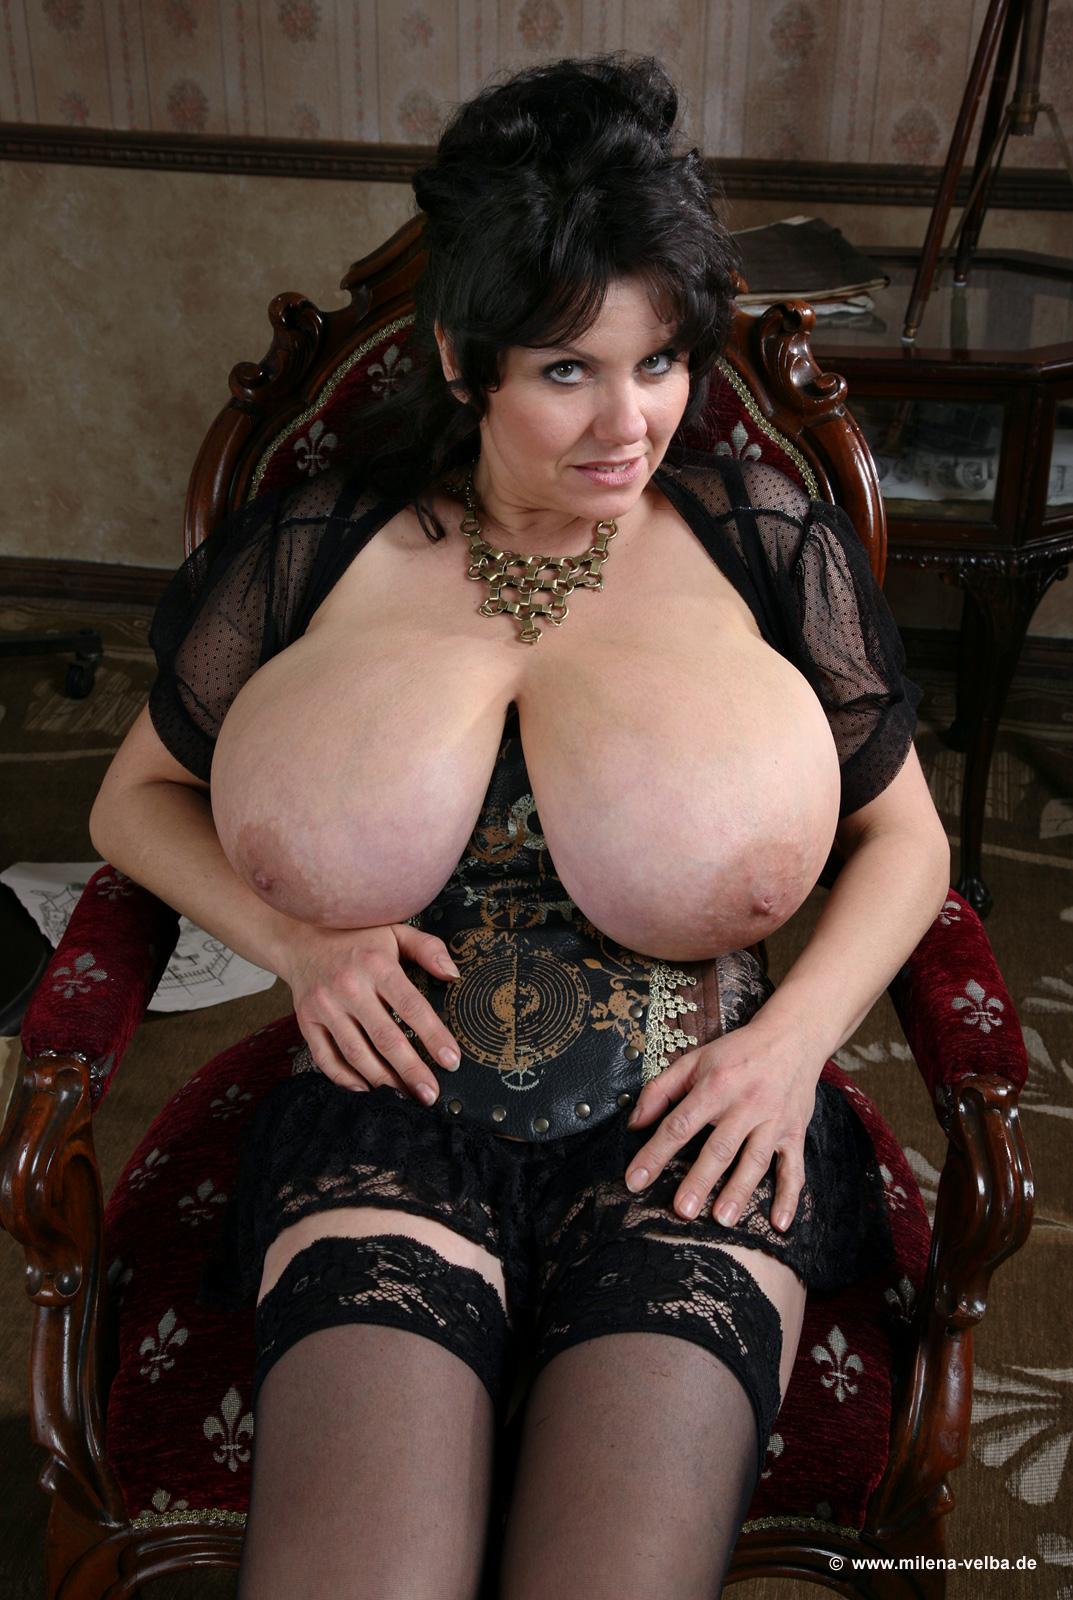 boob press in nude